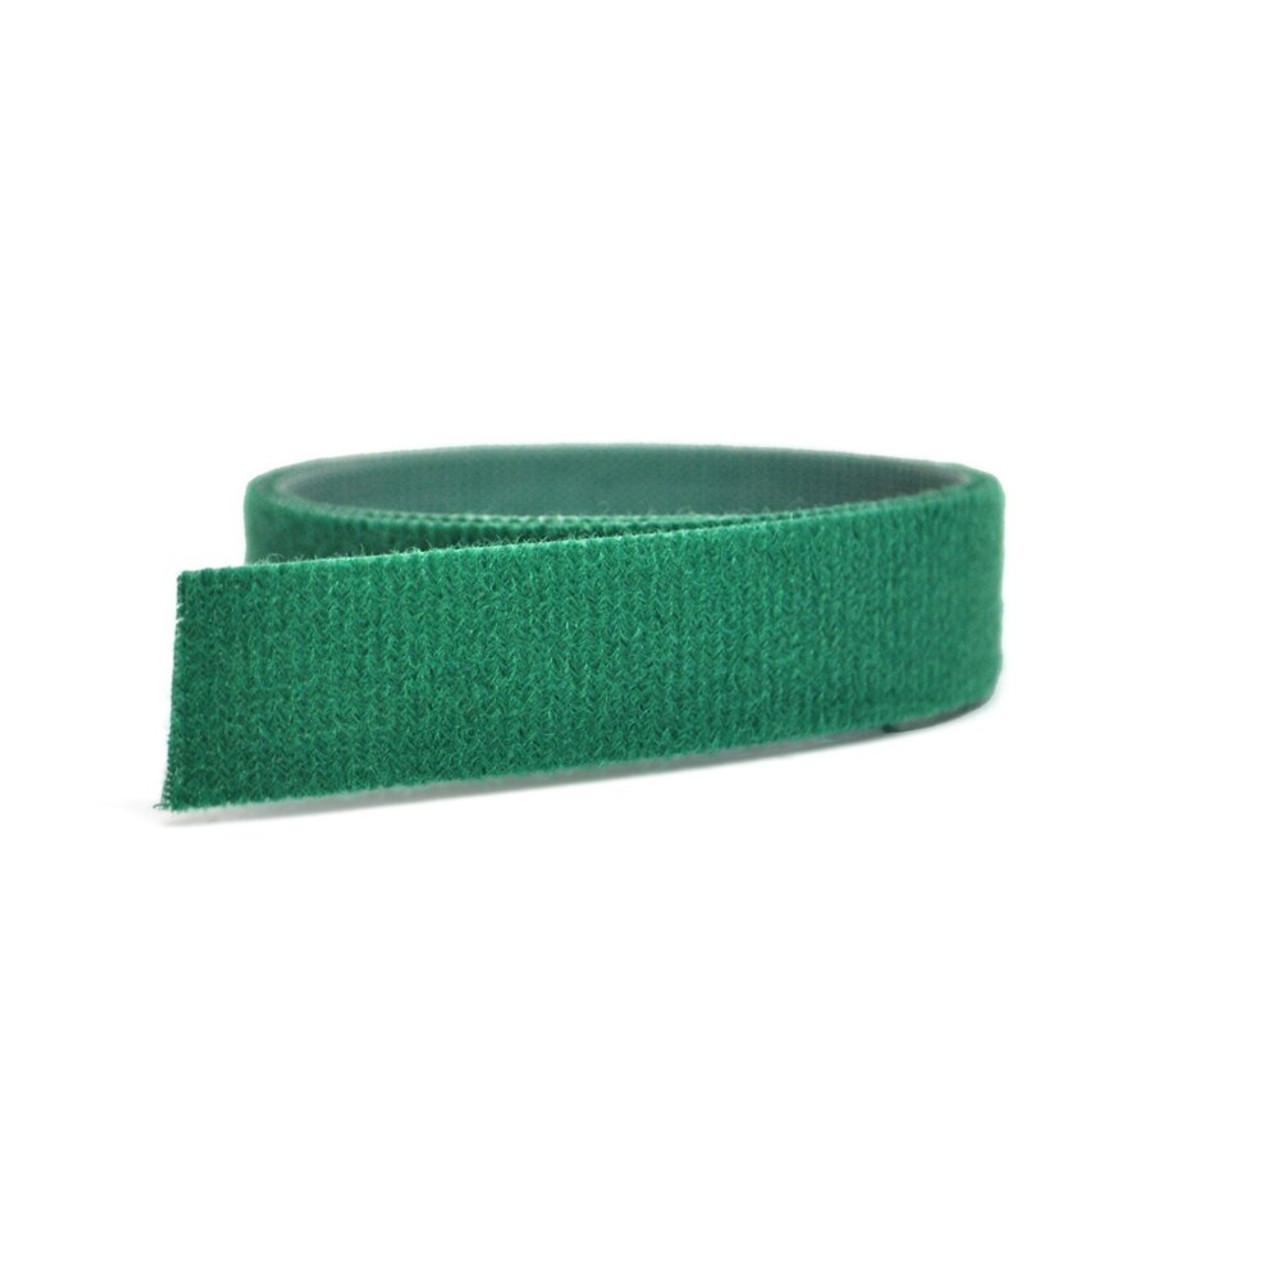 VELCRO® ONE-WRAP® Tape - Green / Velcro Straps - Bundling Straps - Velcro Tie - Velcro Strap